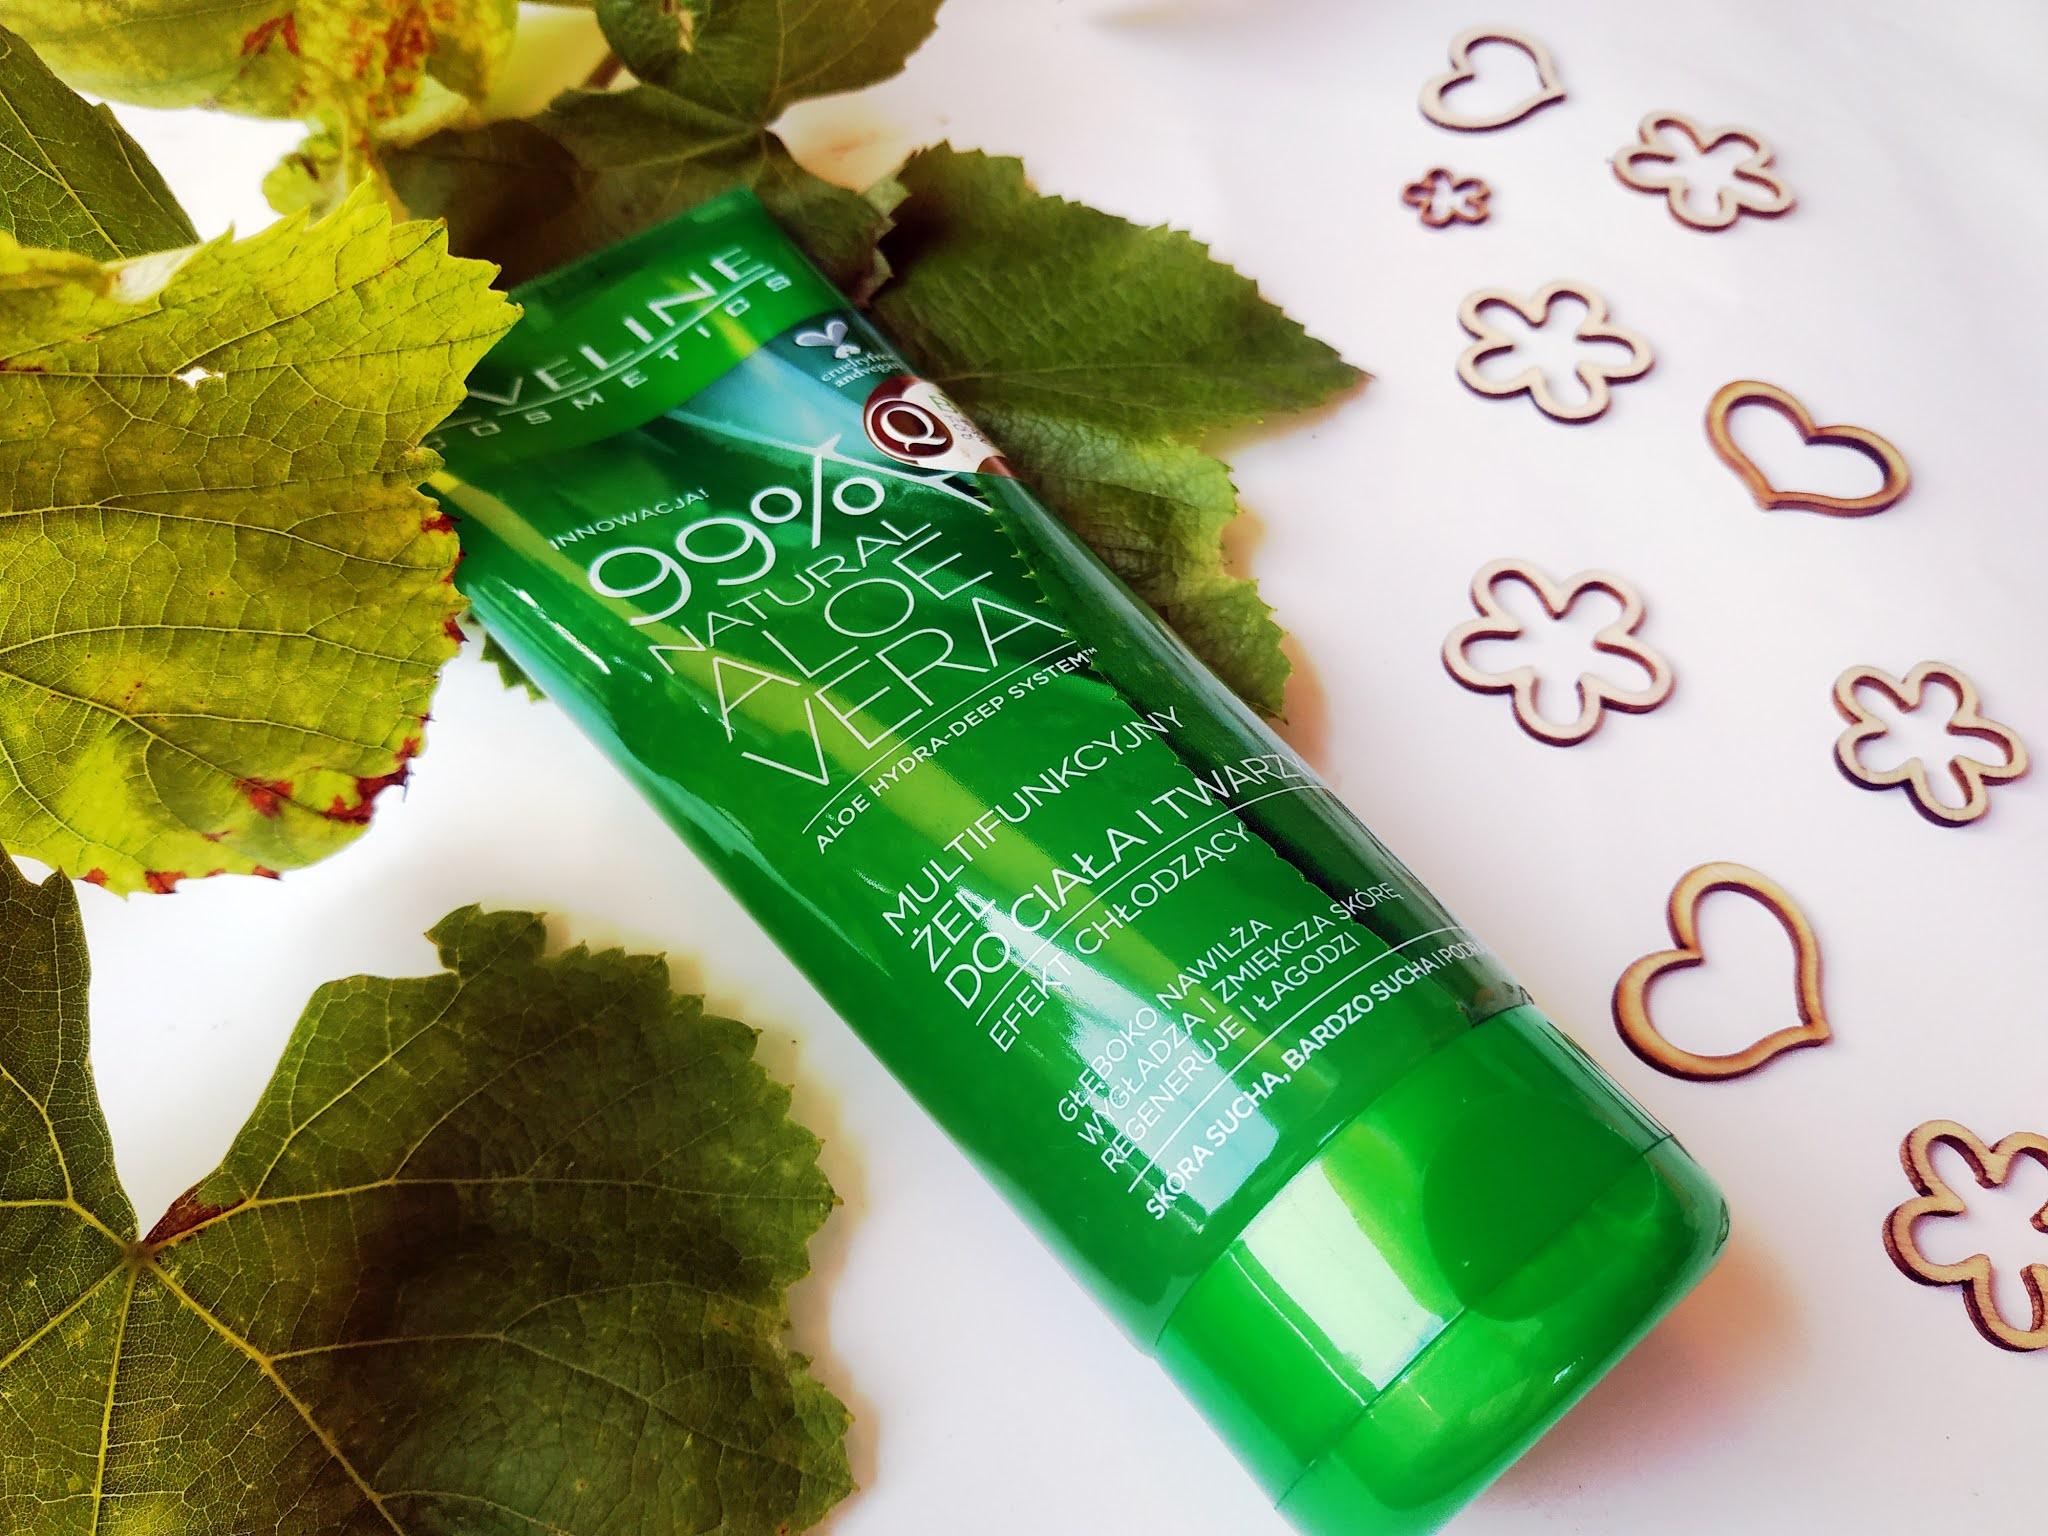 Eveline Natural Aloe Vera multifunkcyjny żel aloesowy od Eveline opinia